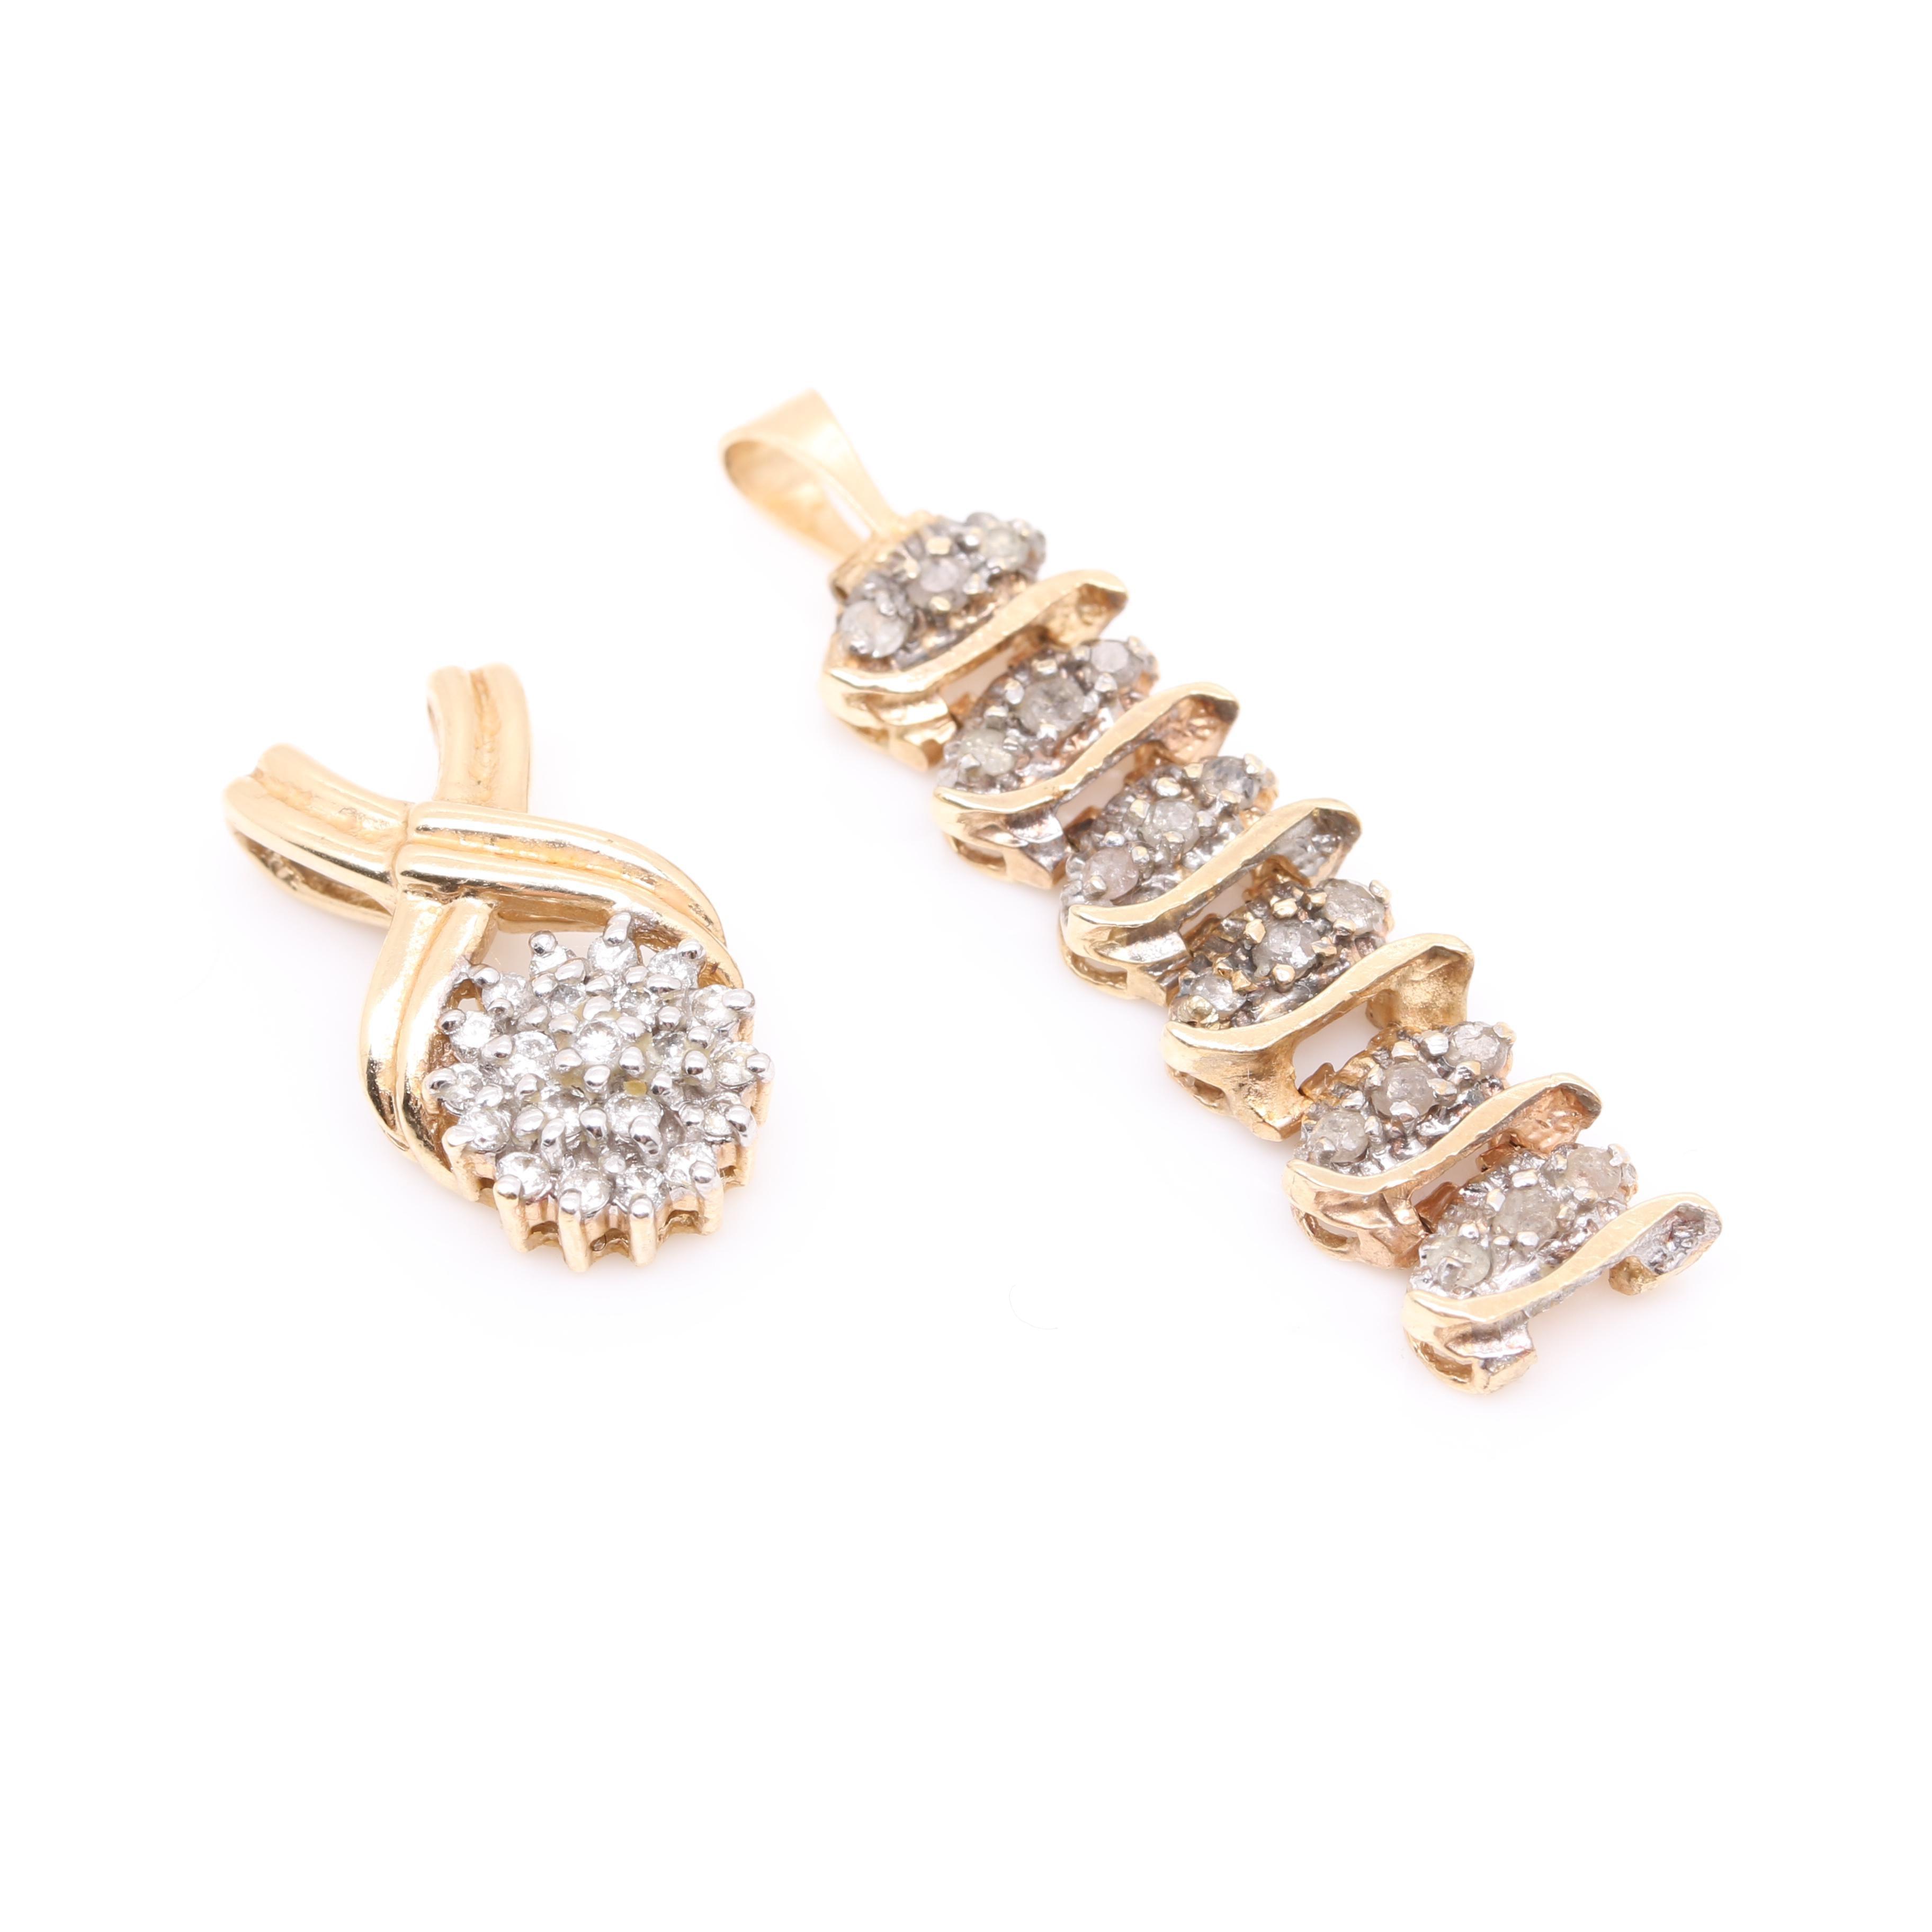 10K and 14K Yellow Gold Diamond Pendants